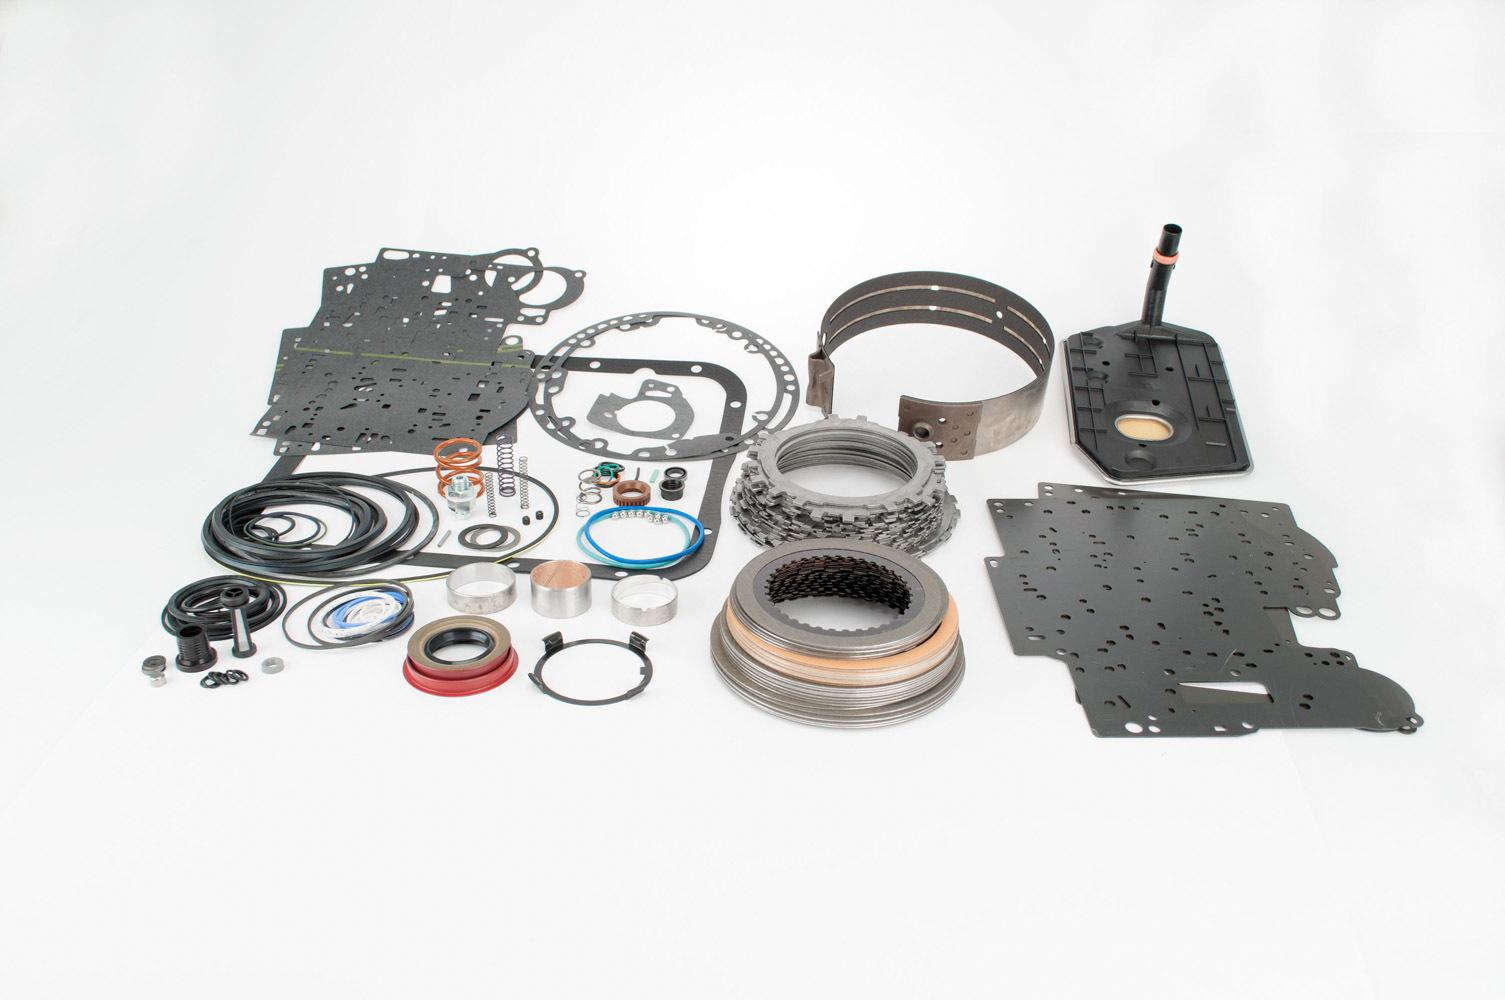 Tci 86-Up 700R4 Pro Super Kit